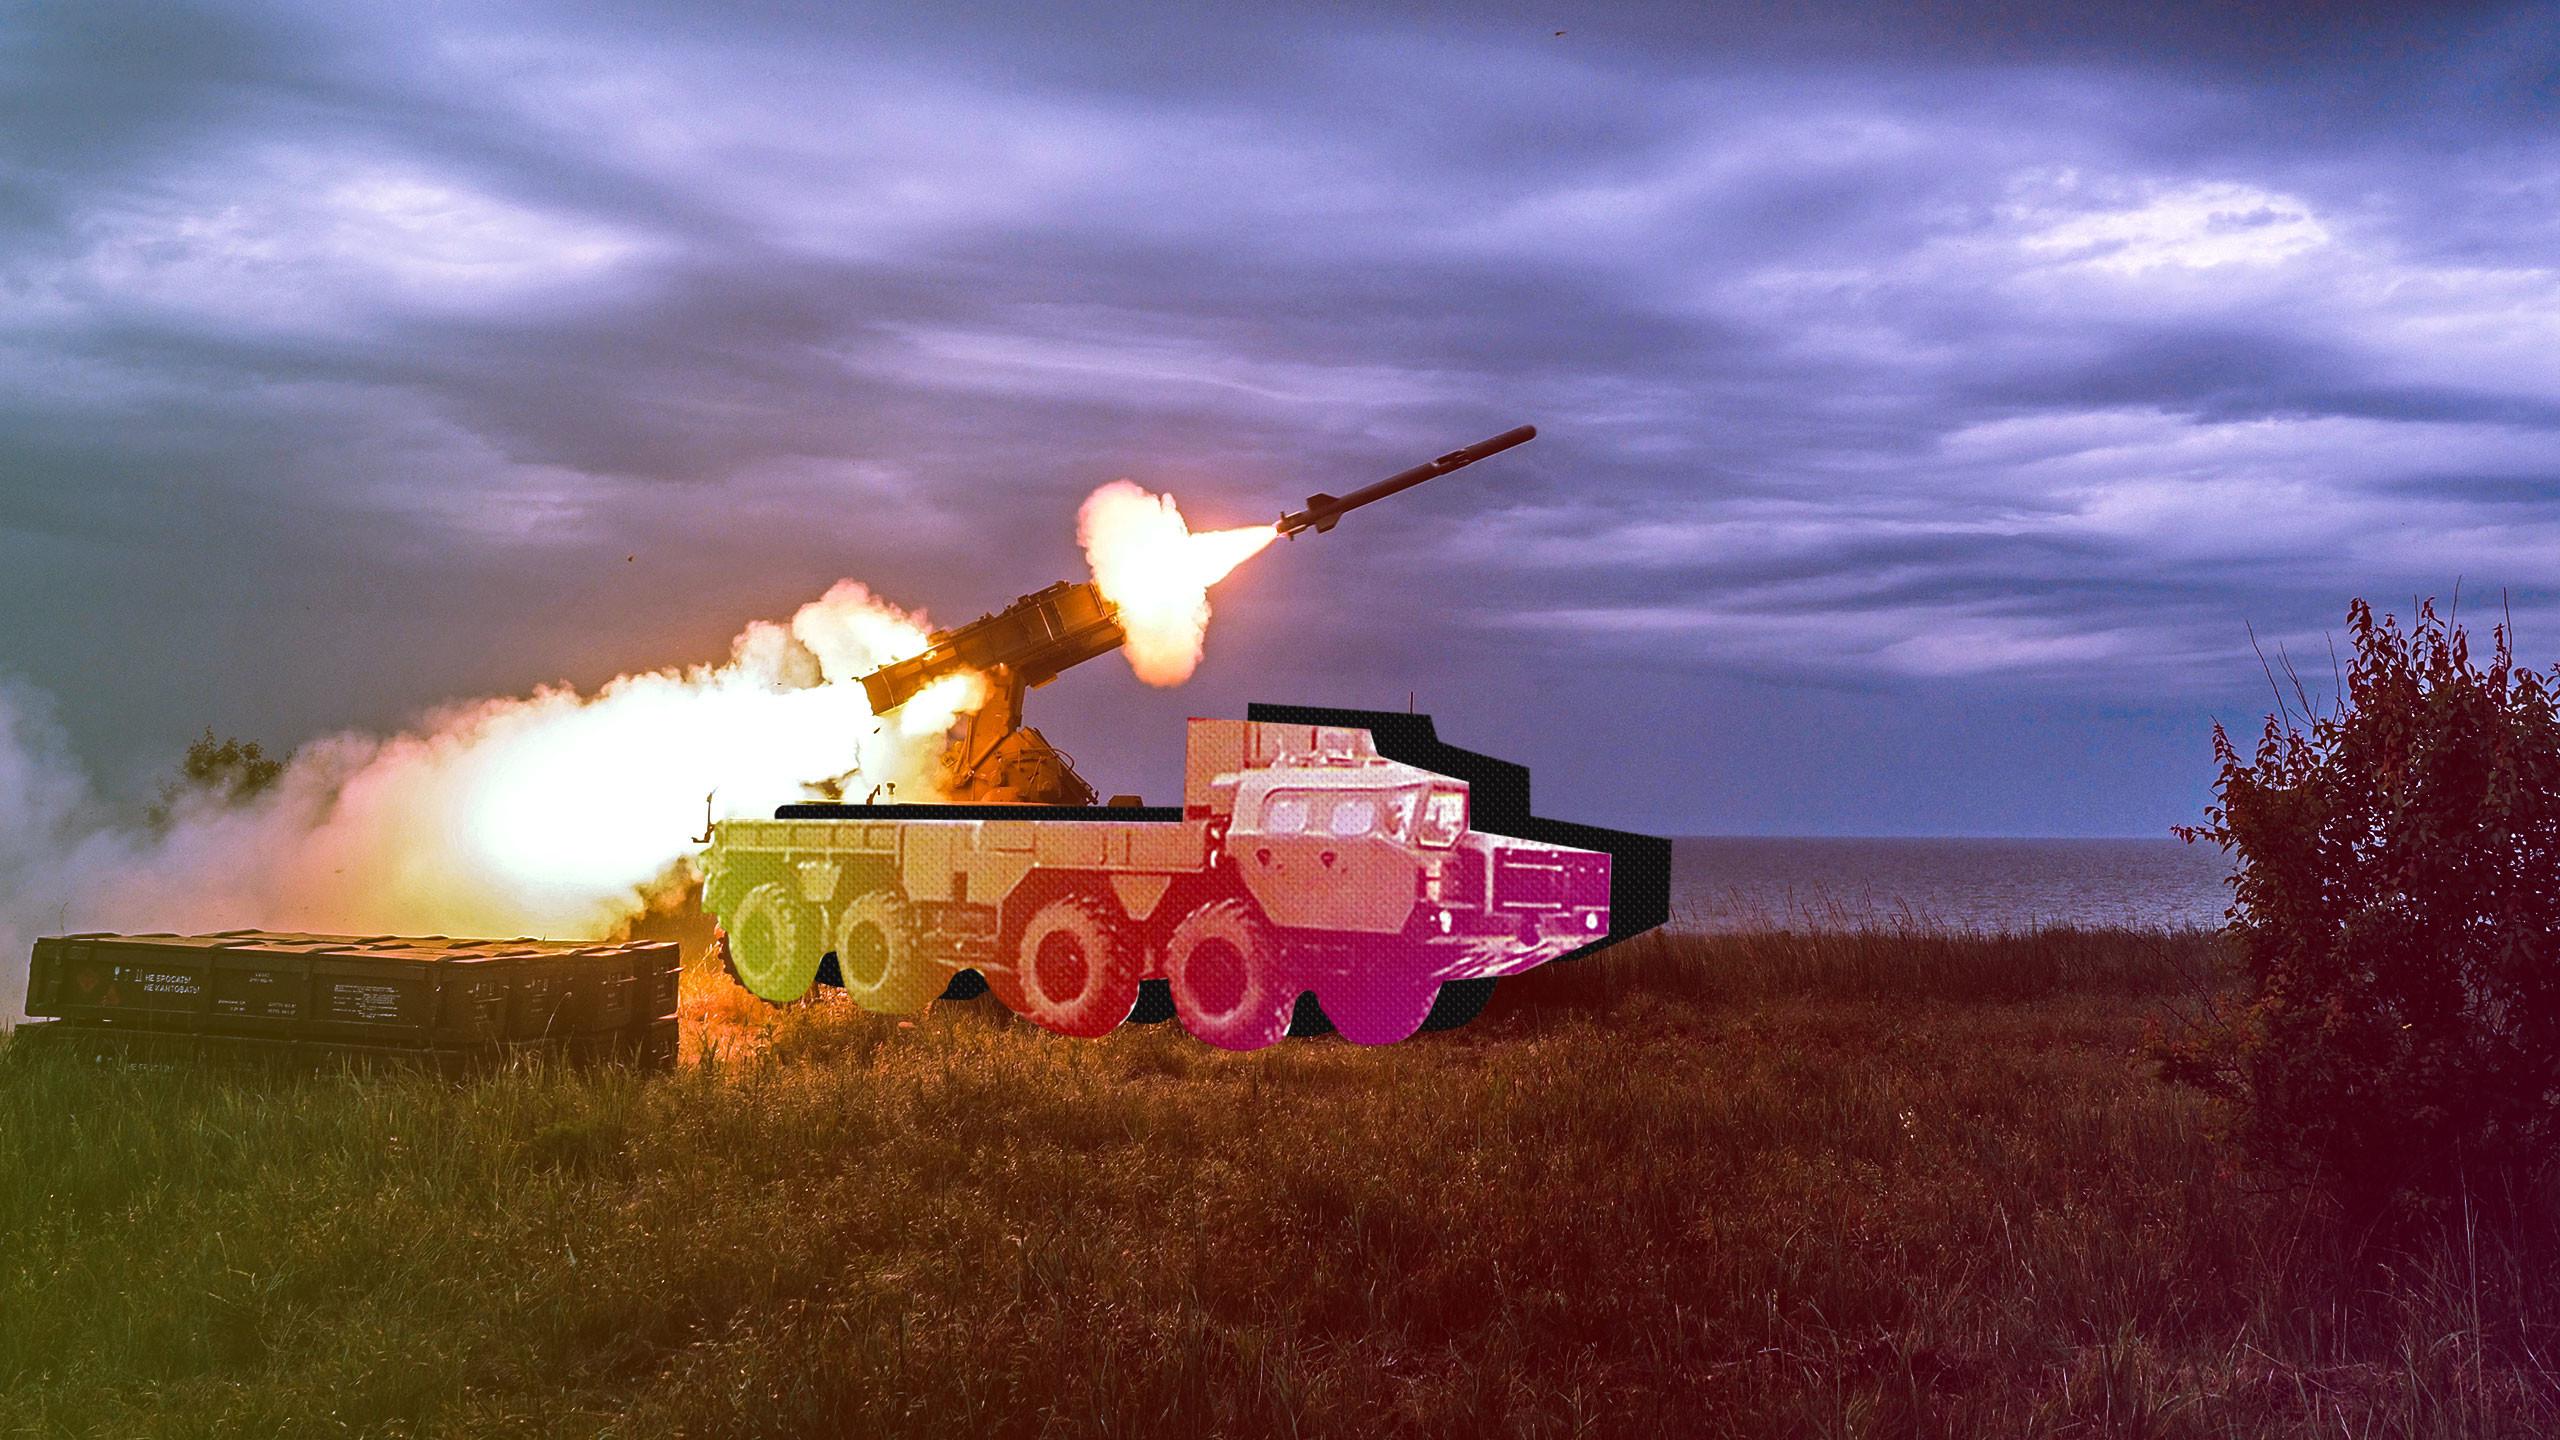 "<p>Коллаж L!FE. Фото: &copy; РИА Новости/<span>Виталий Тимкив,&nbsp;<a href=""http://militaryrussia.ru/blog/topic-697.html"" target=""_blank"">militaryrussia.ru</a></span></p>"